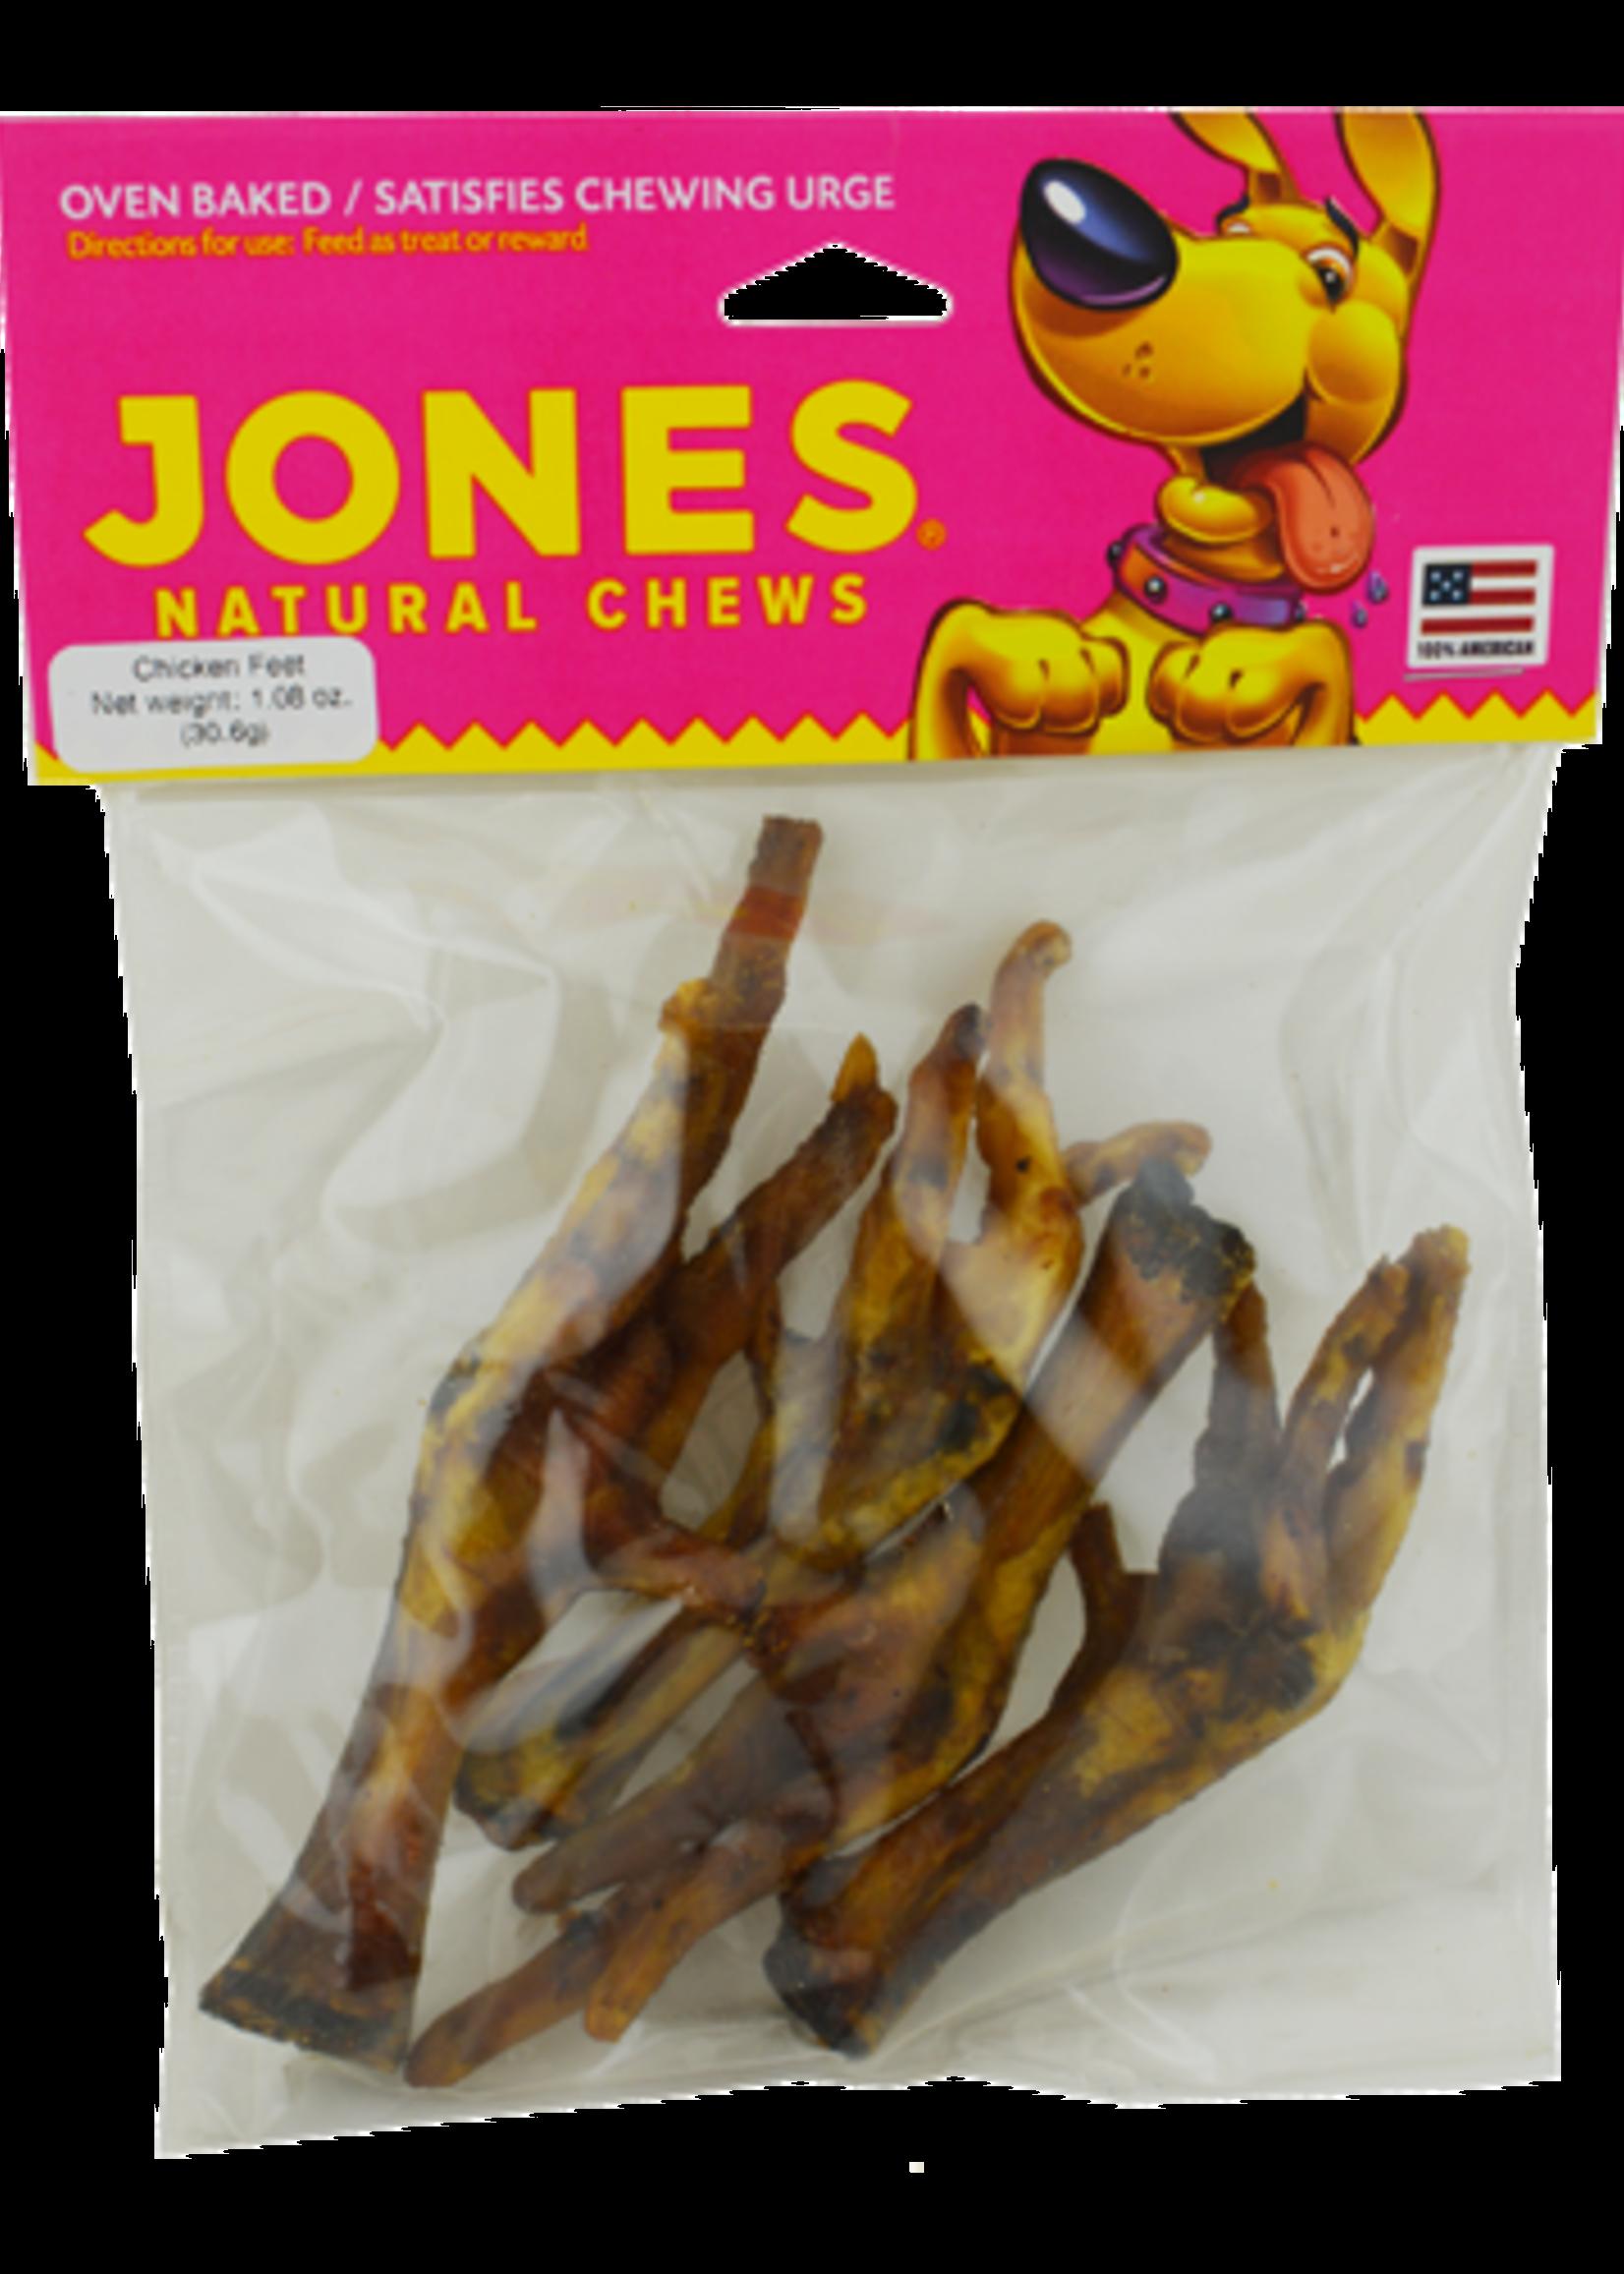 Jones Natural Chews Jones Natural Chews Chicken Feet